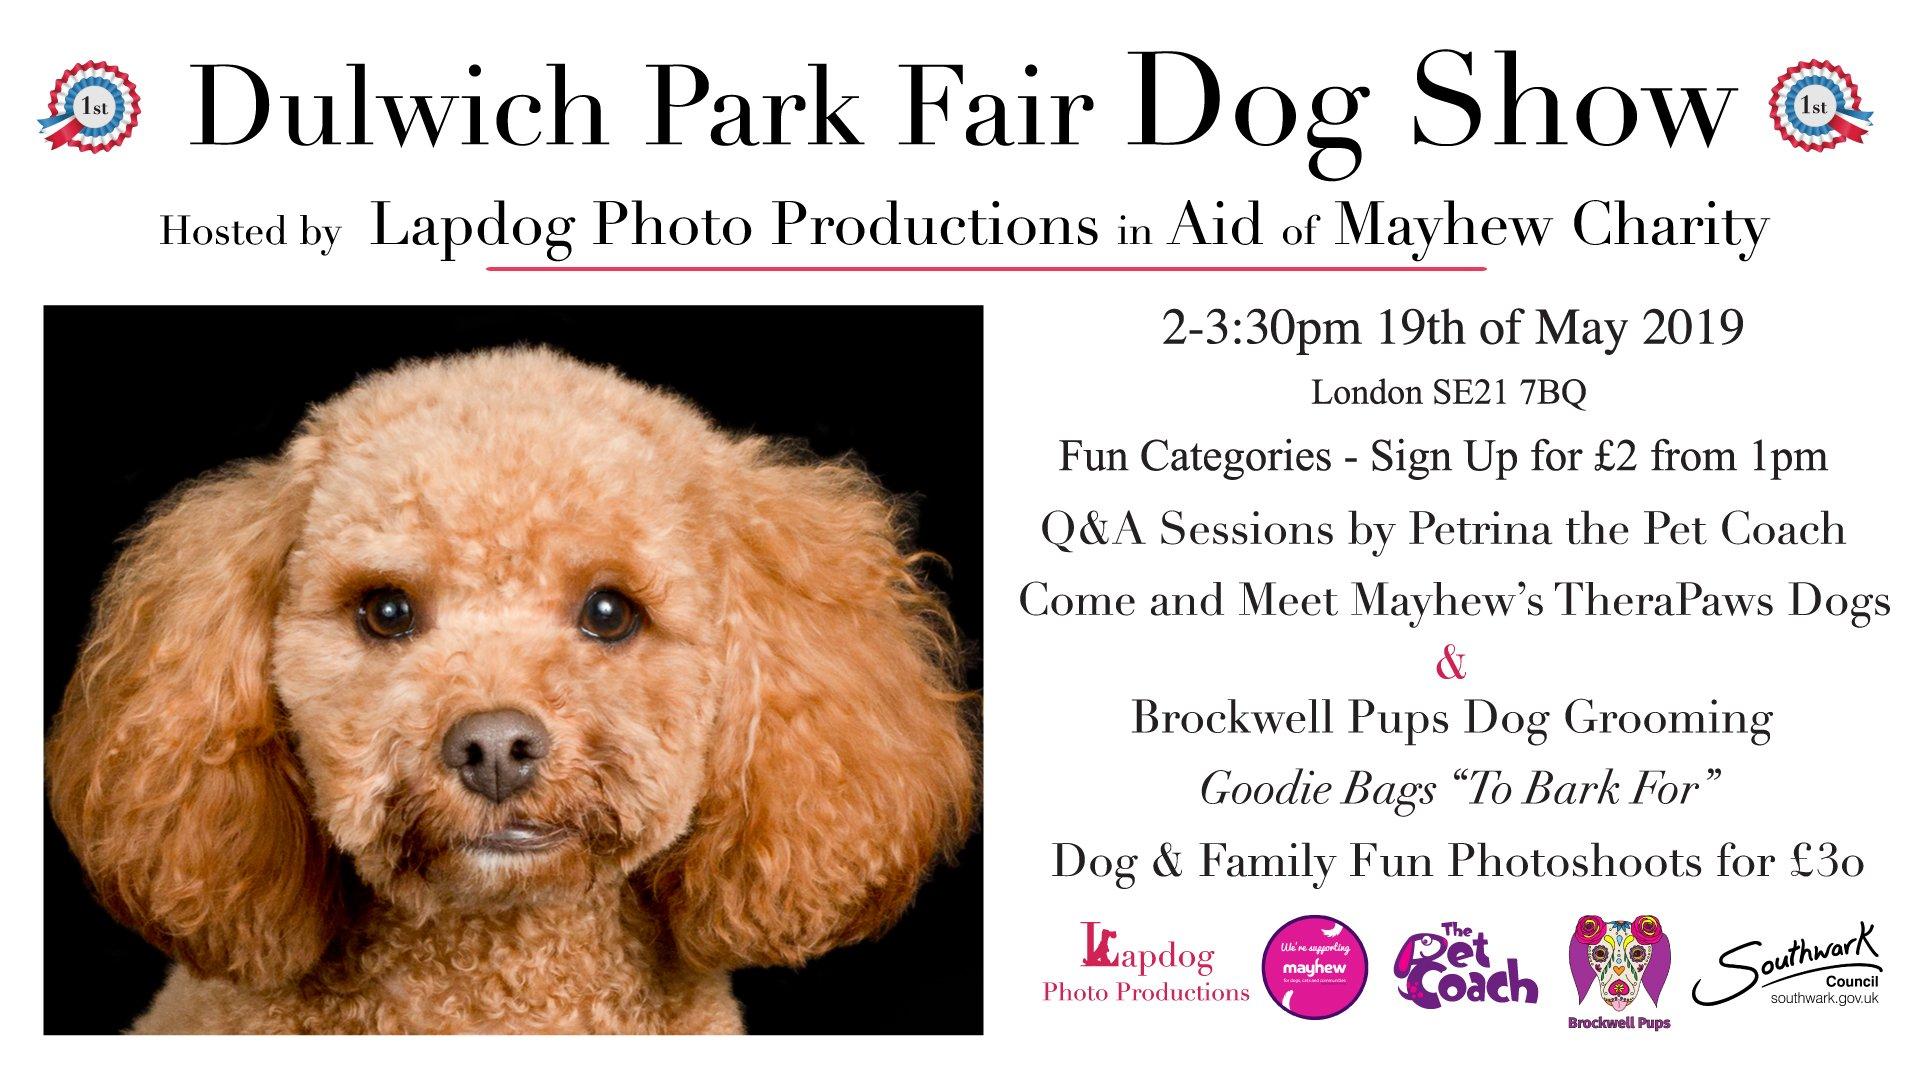 Dulwich Park Fair Dog Show   The Londog